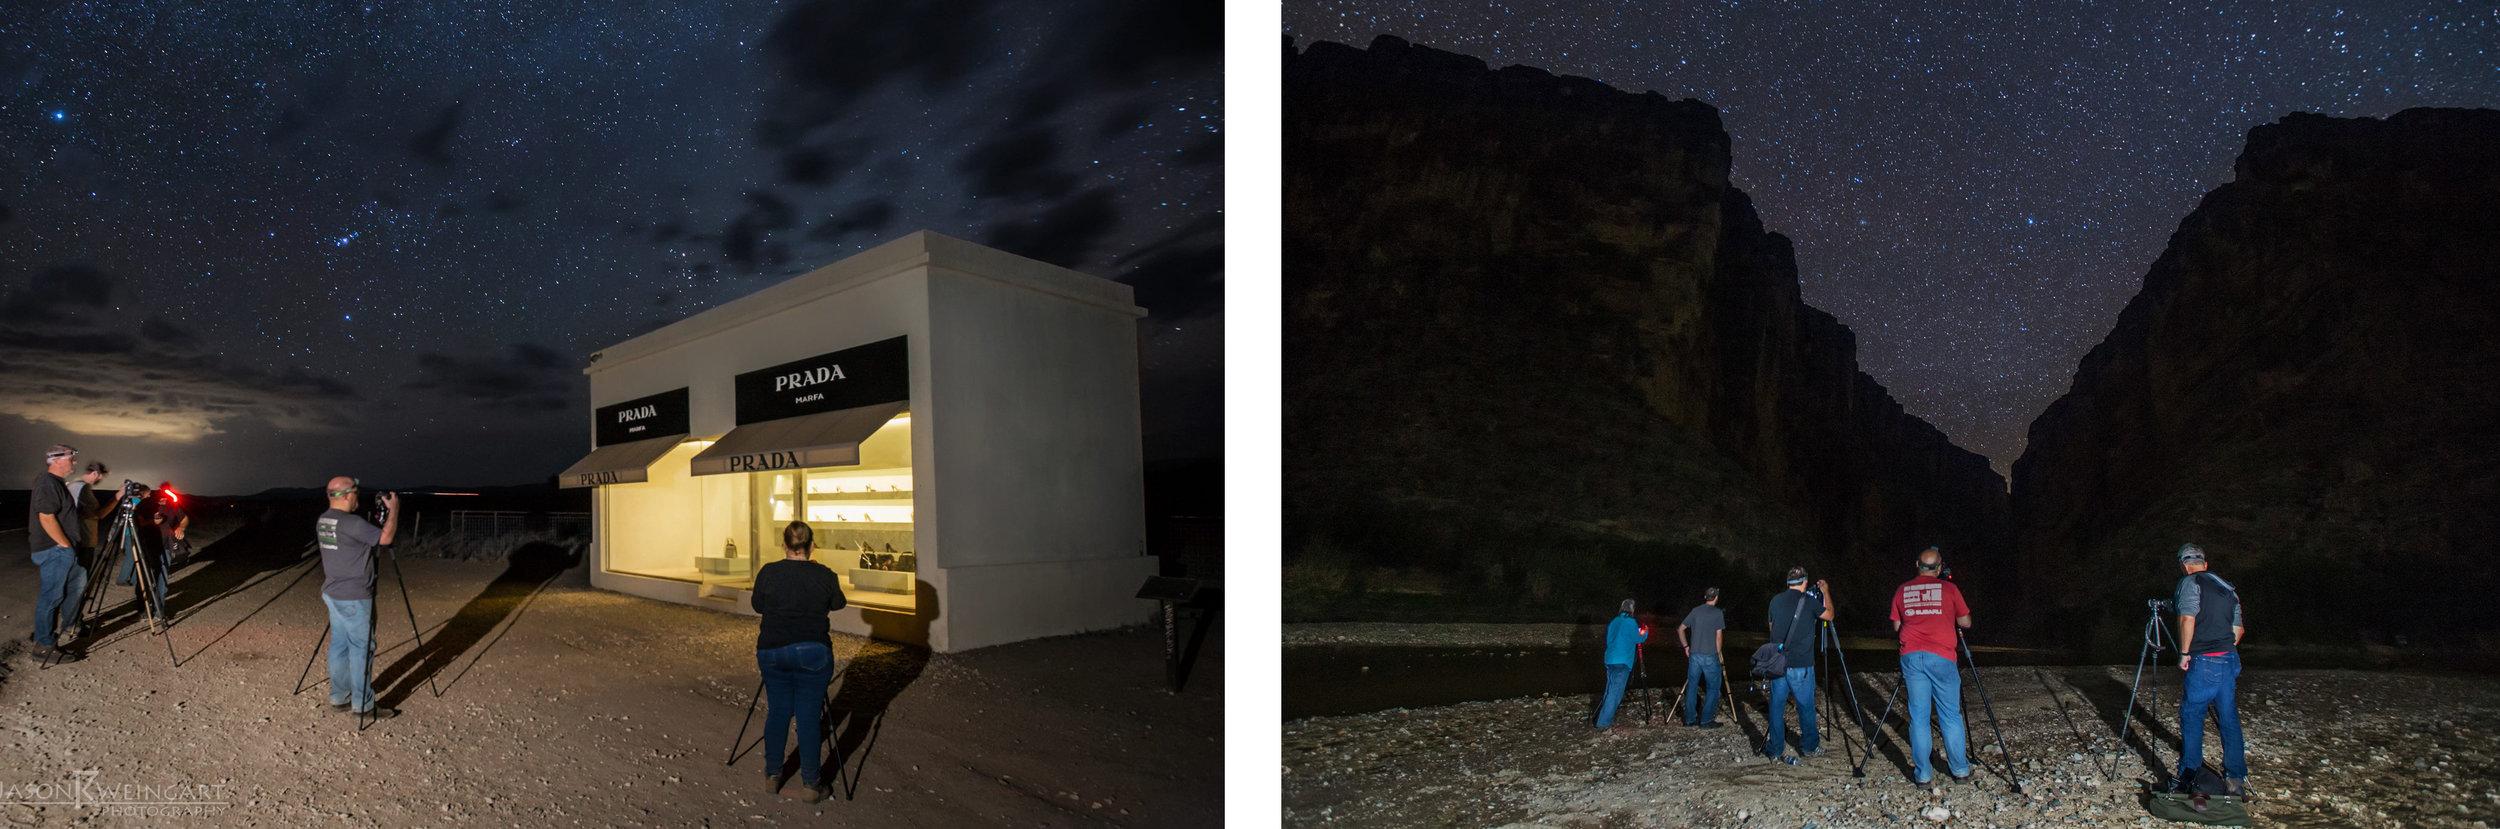 Astrophotography workshop participants at Prada Marfa (left) and the Santa Elena Canyon / Rio Grande River (right).